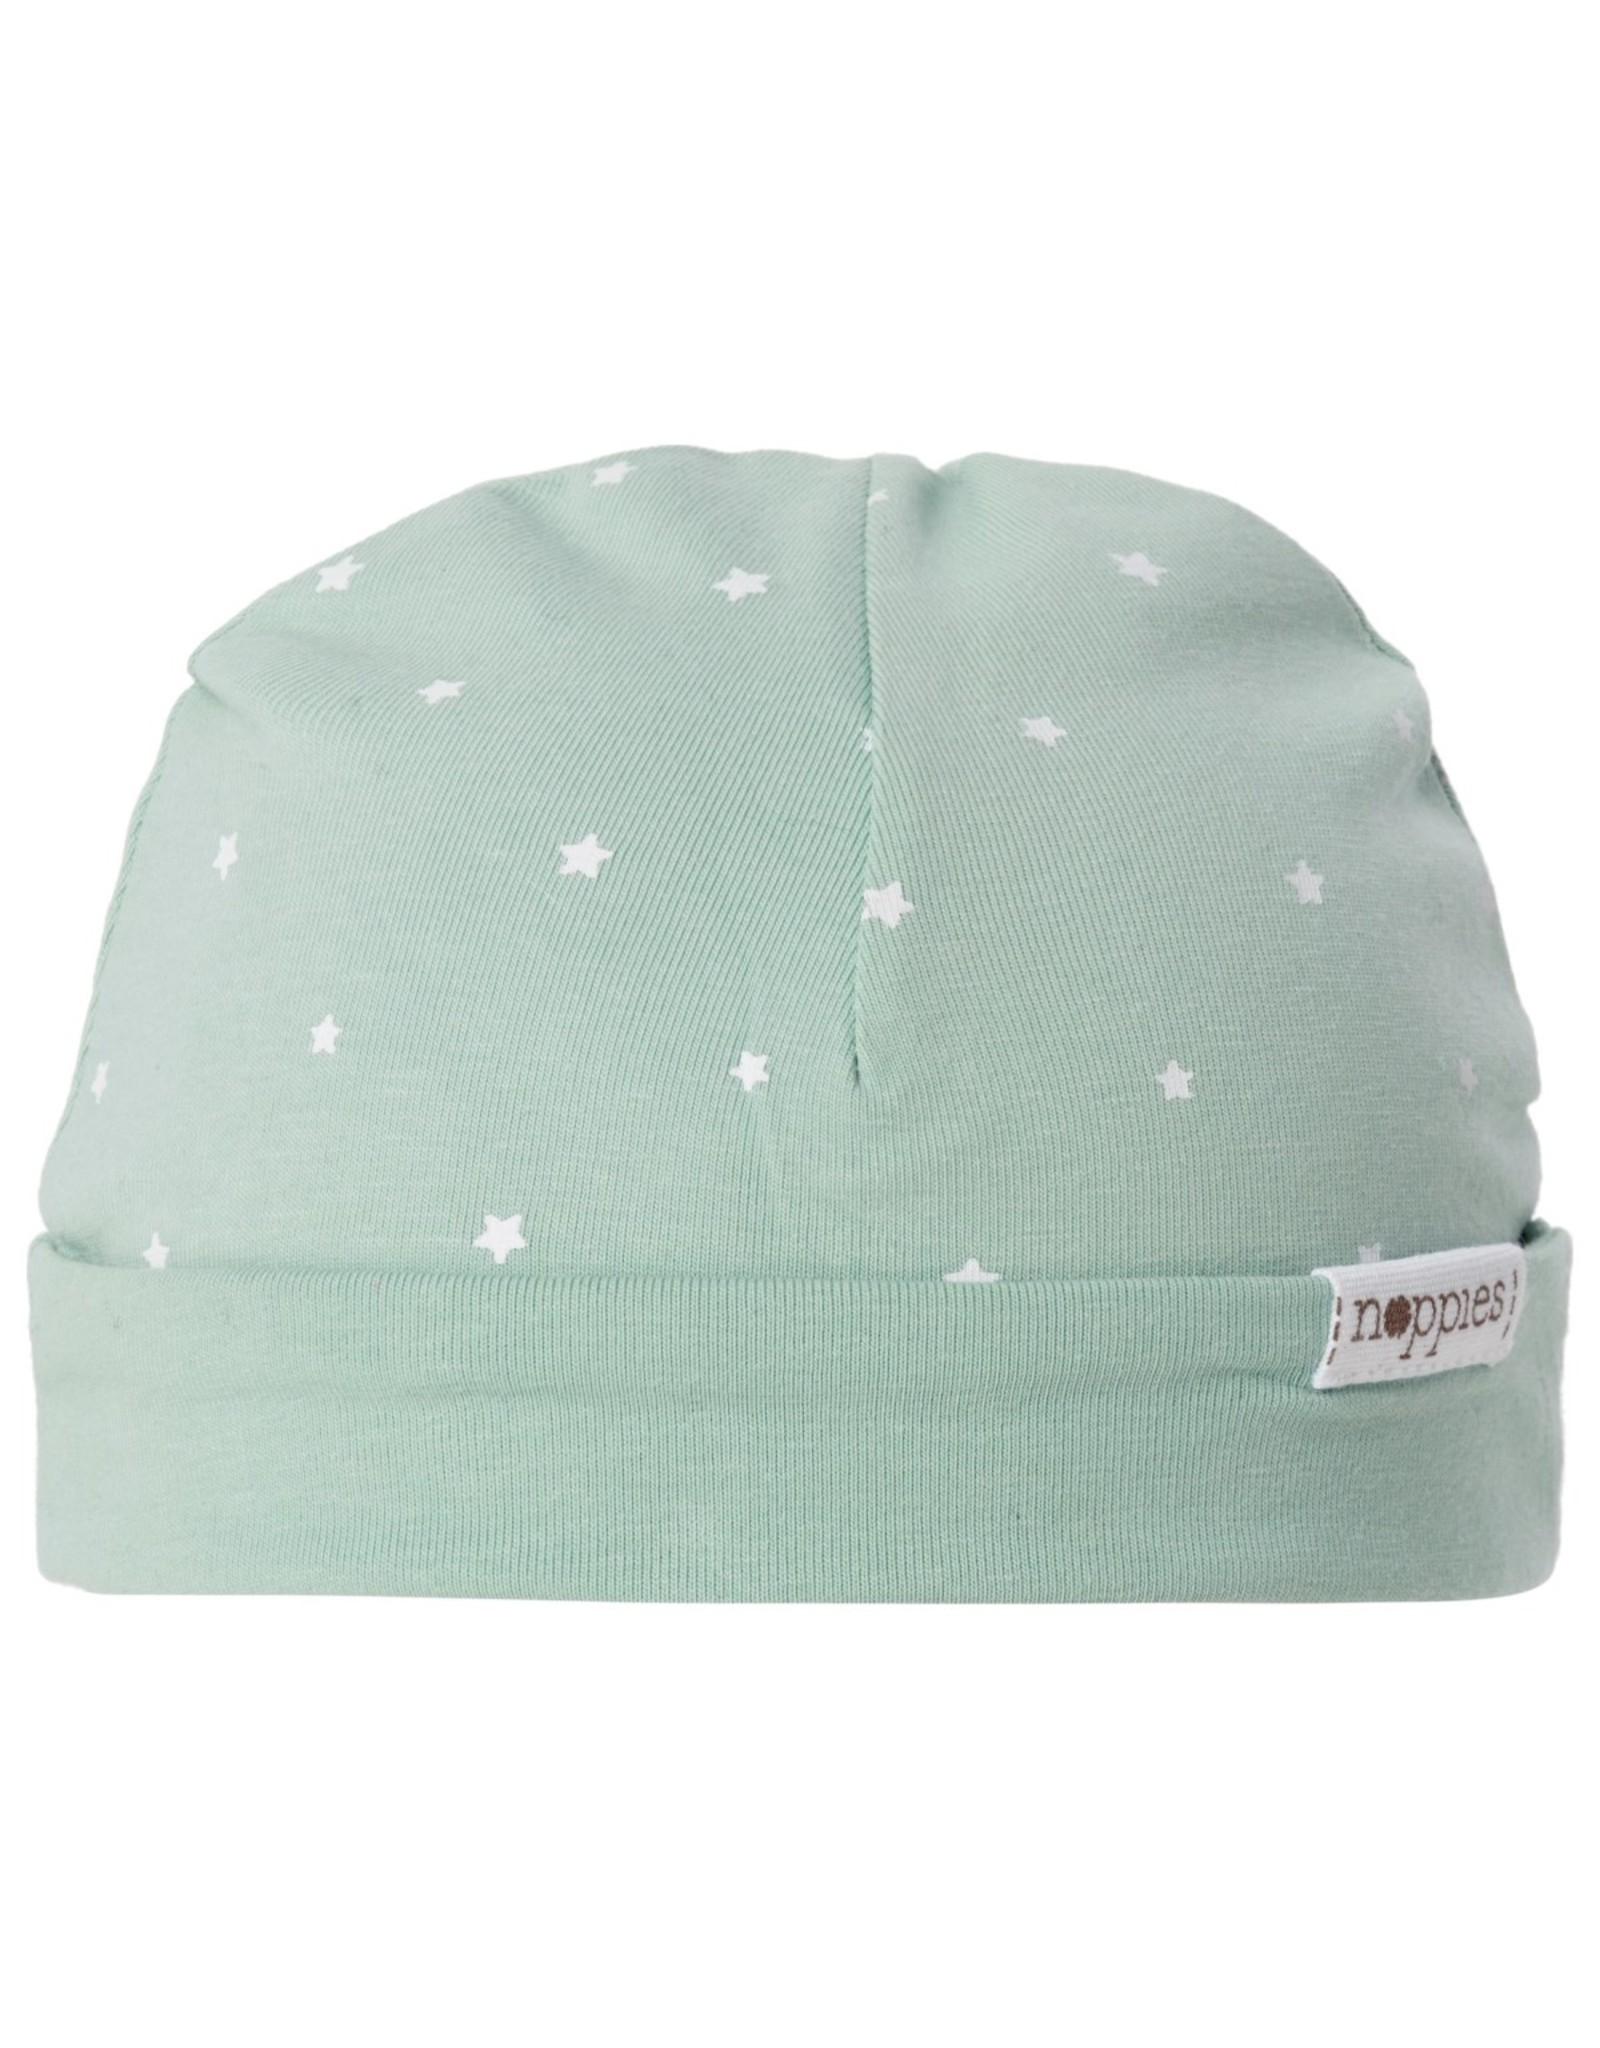 Noppies U Hat REV Dani AOP grey mint